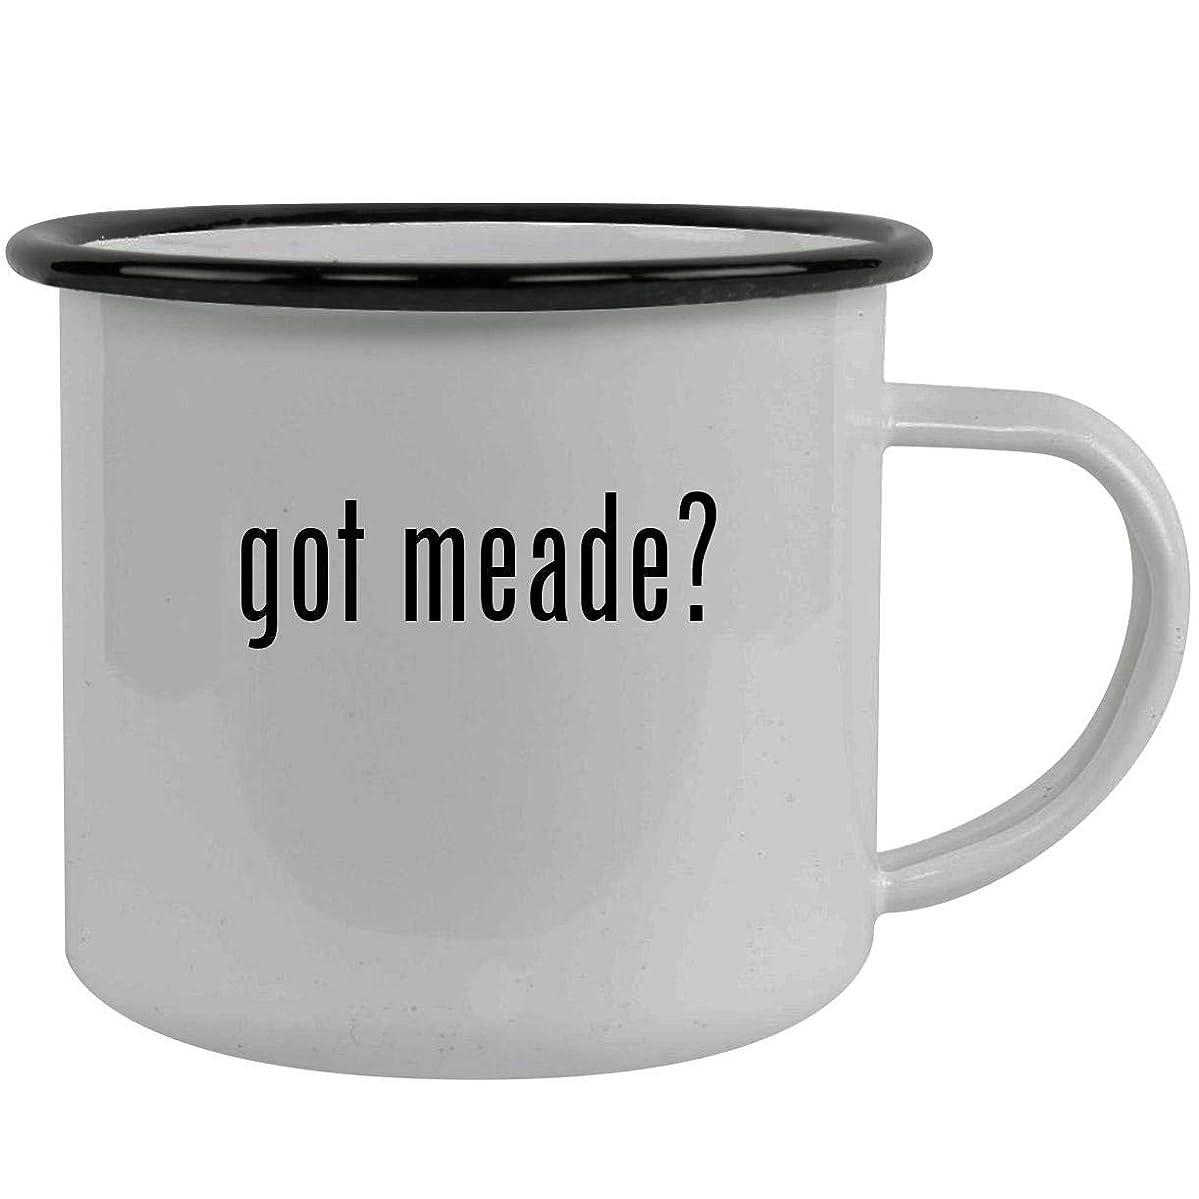 got meade? - Stainless Steel 12oz Camping Mug, Black